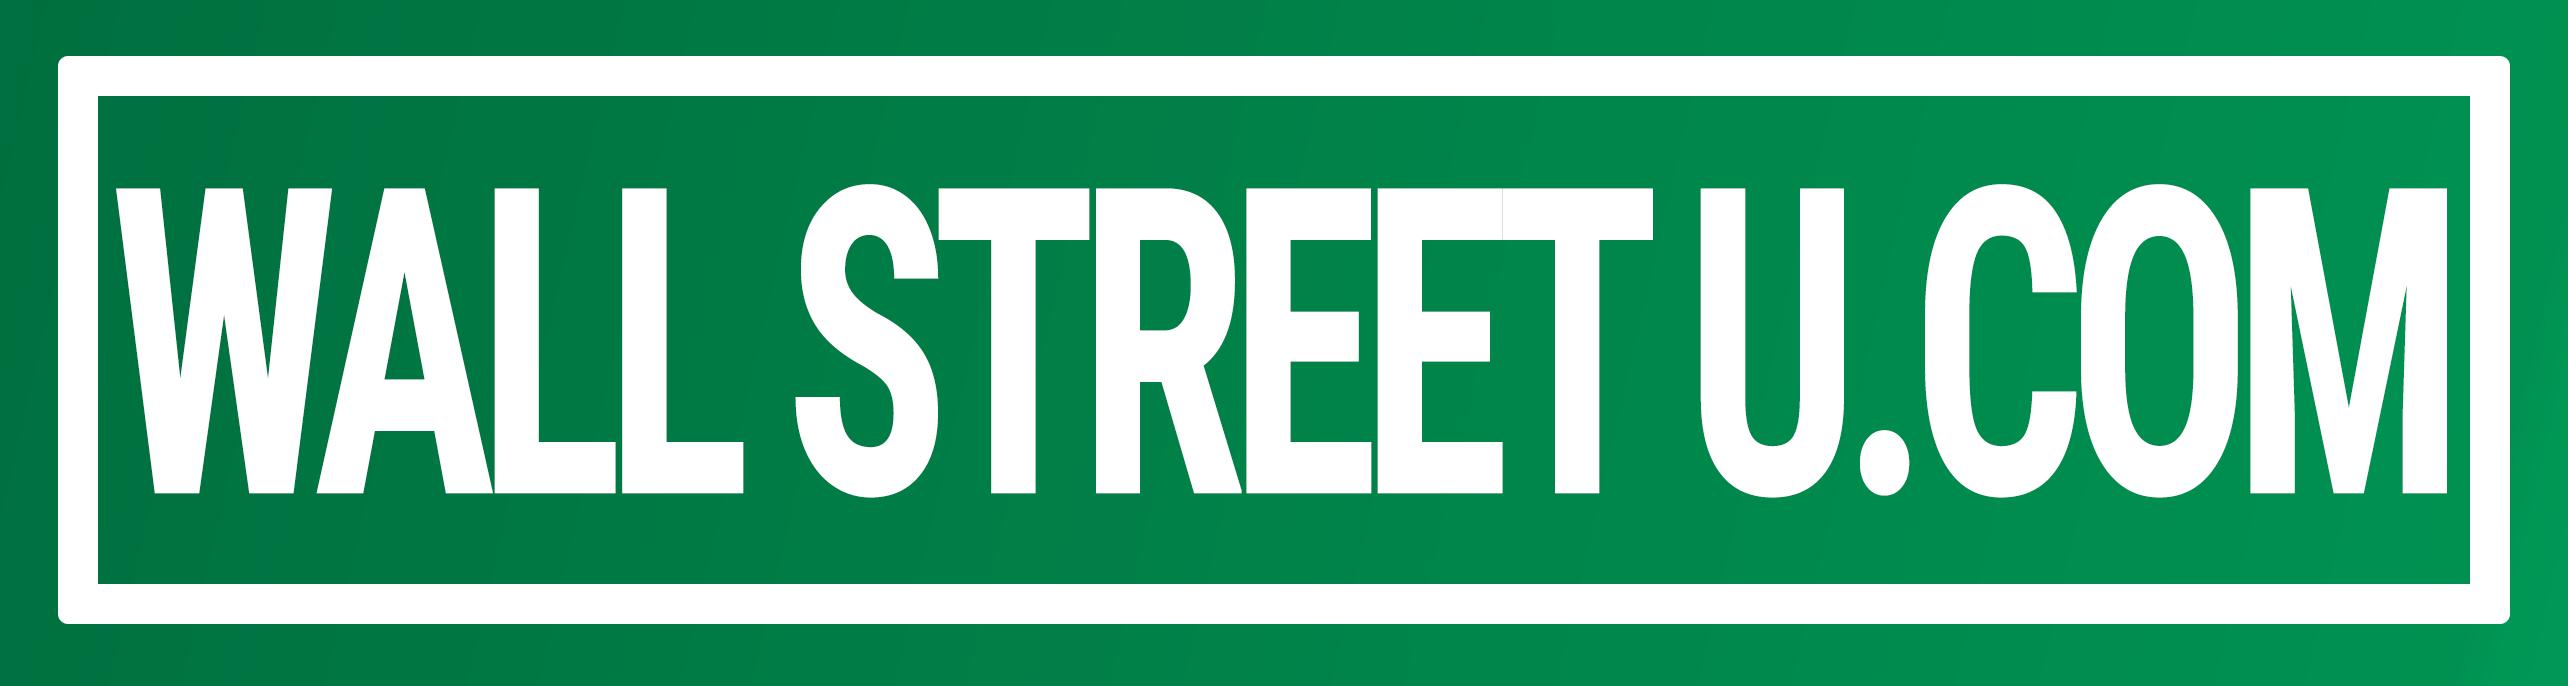 WallStreetU Educational Source For Trading Stocks, Options & Futures logo